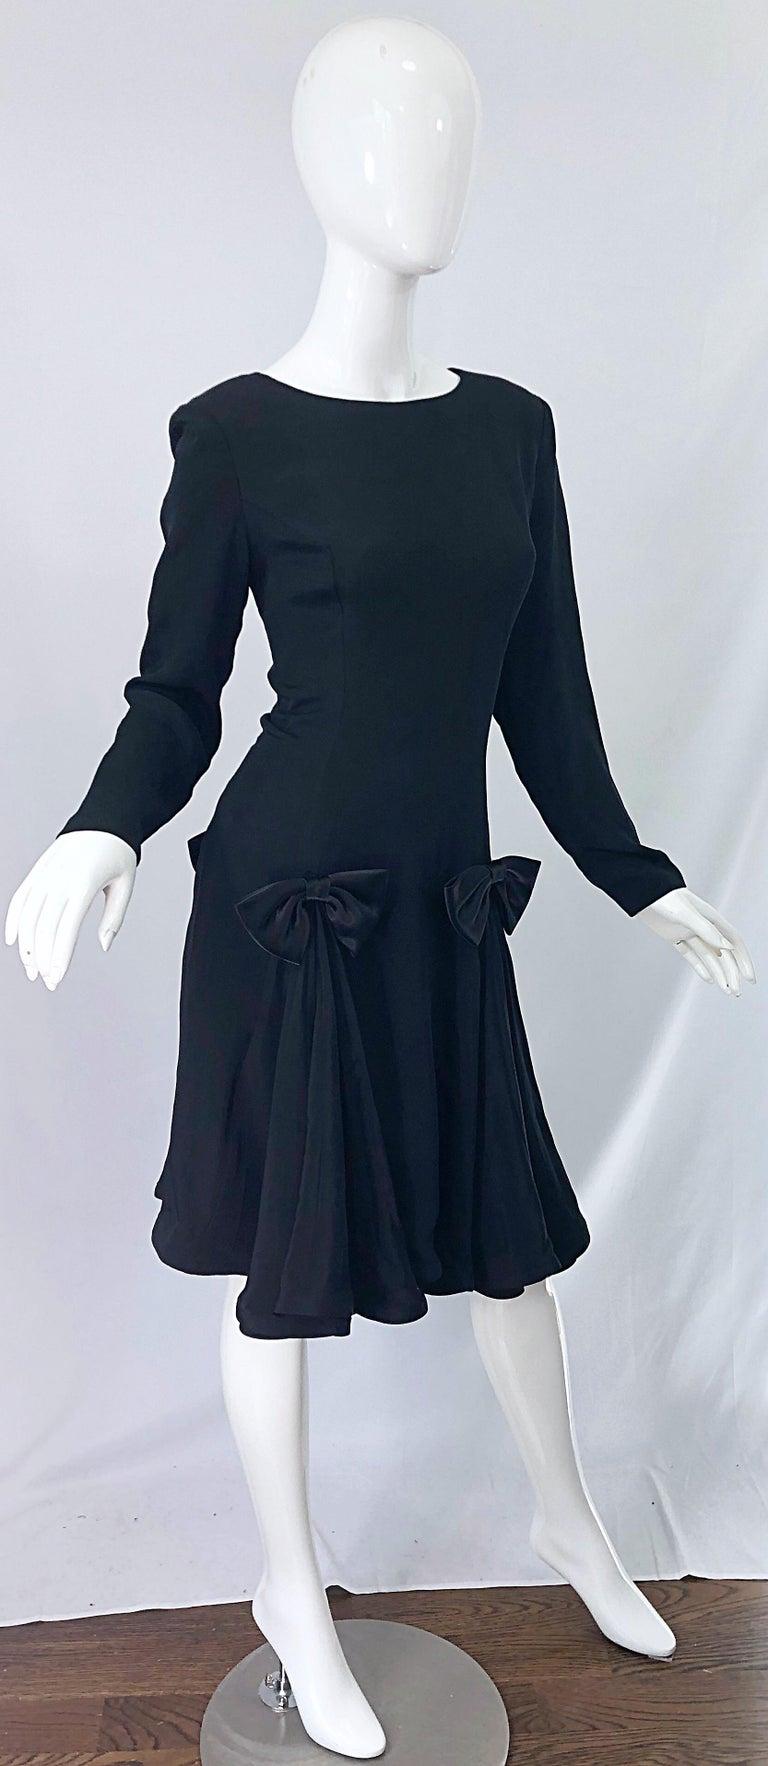 Vintage Pierre Cardin Size 8 Black Silk 1990s Long Sleeve 90s Bow Dress For Sale 6